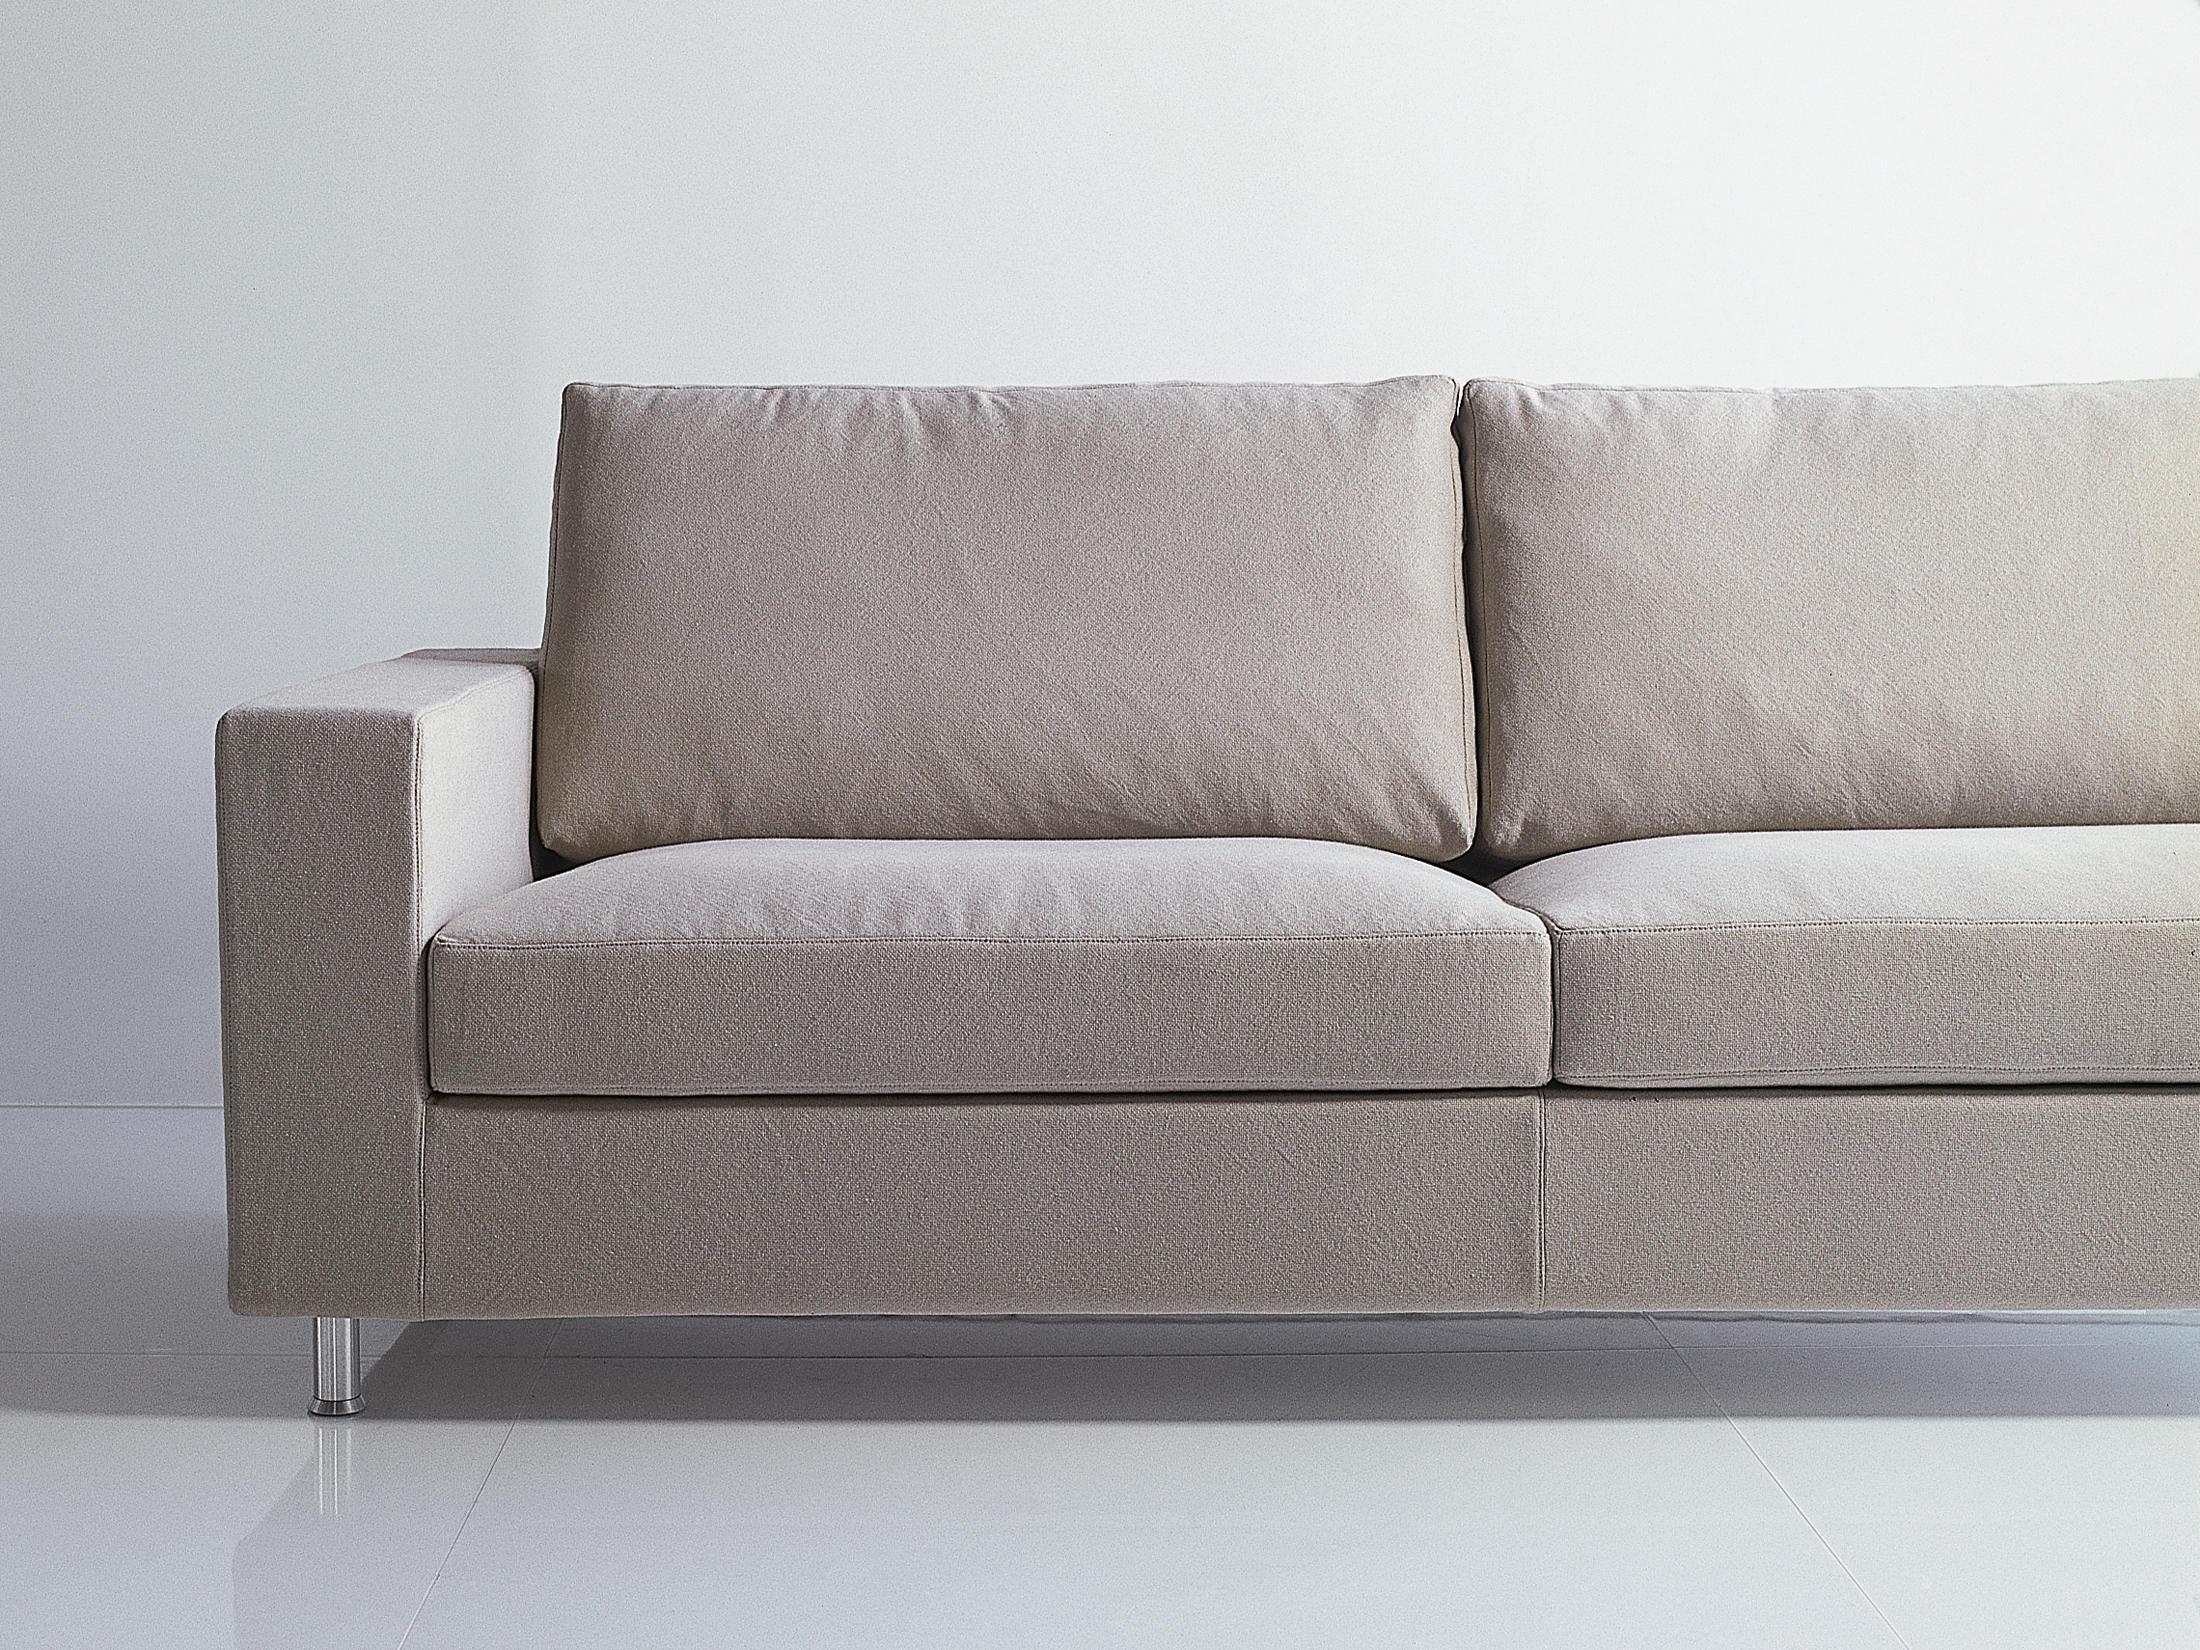 Terra sof s lounge de rafemar architonic - Rafemar sofas ...